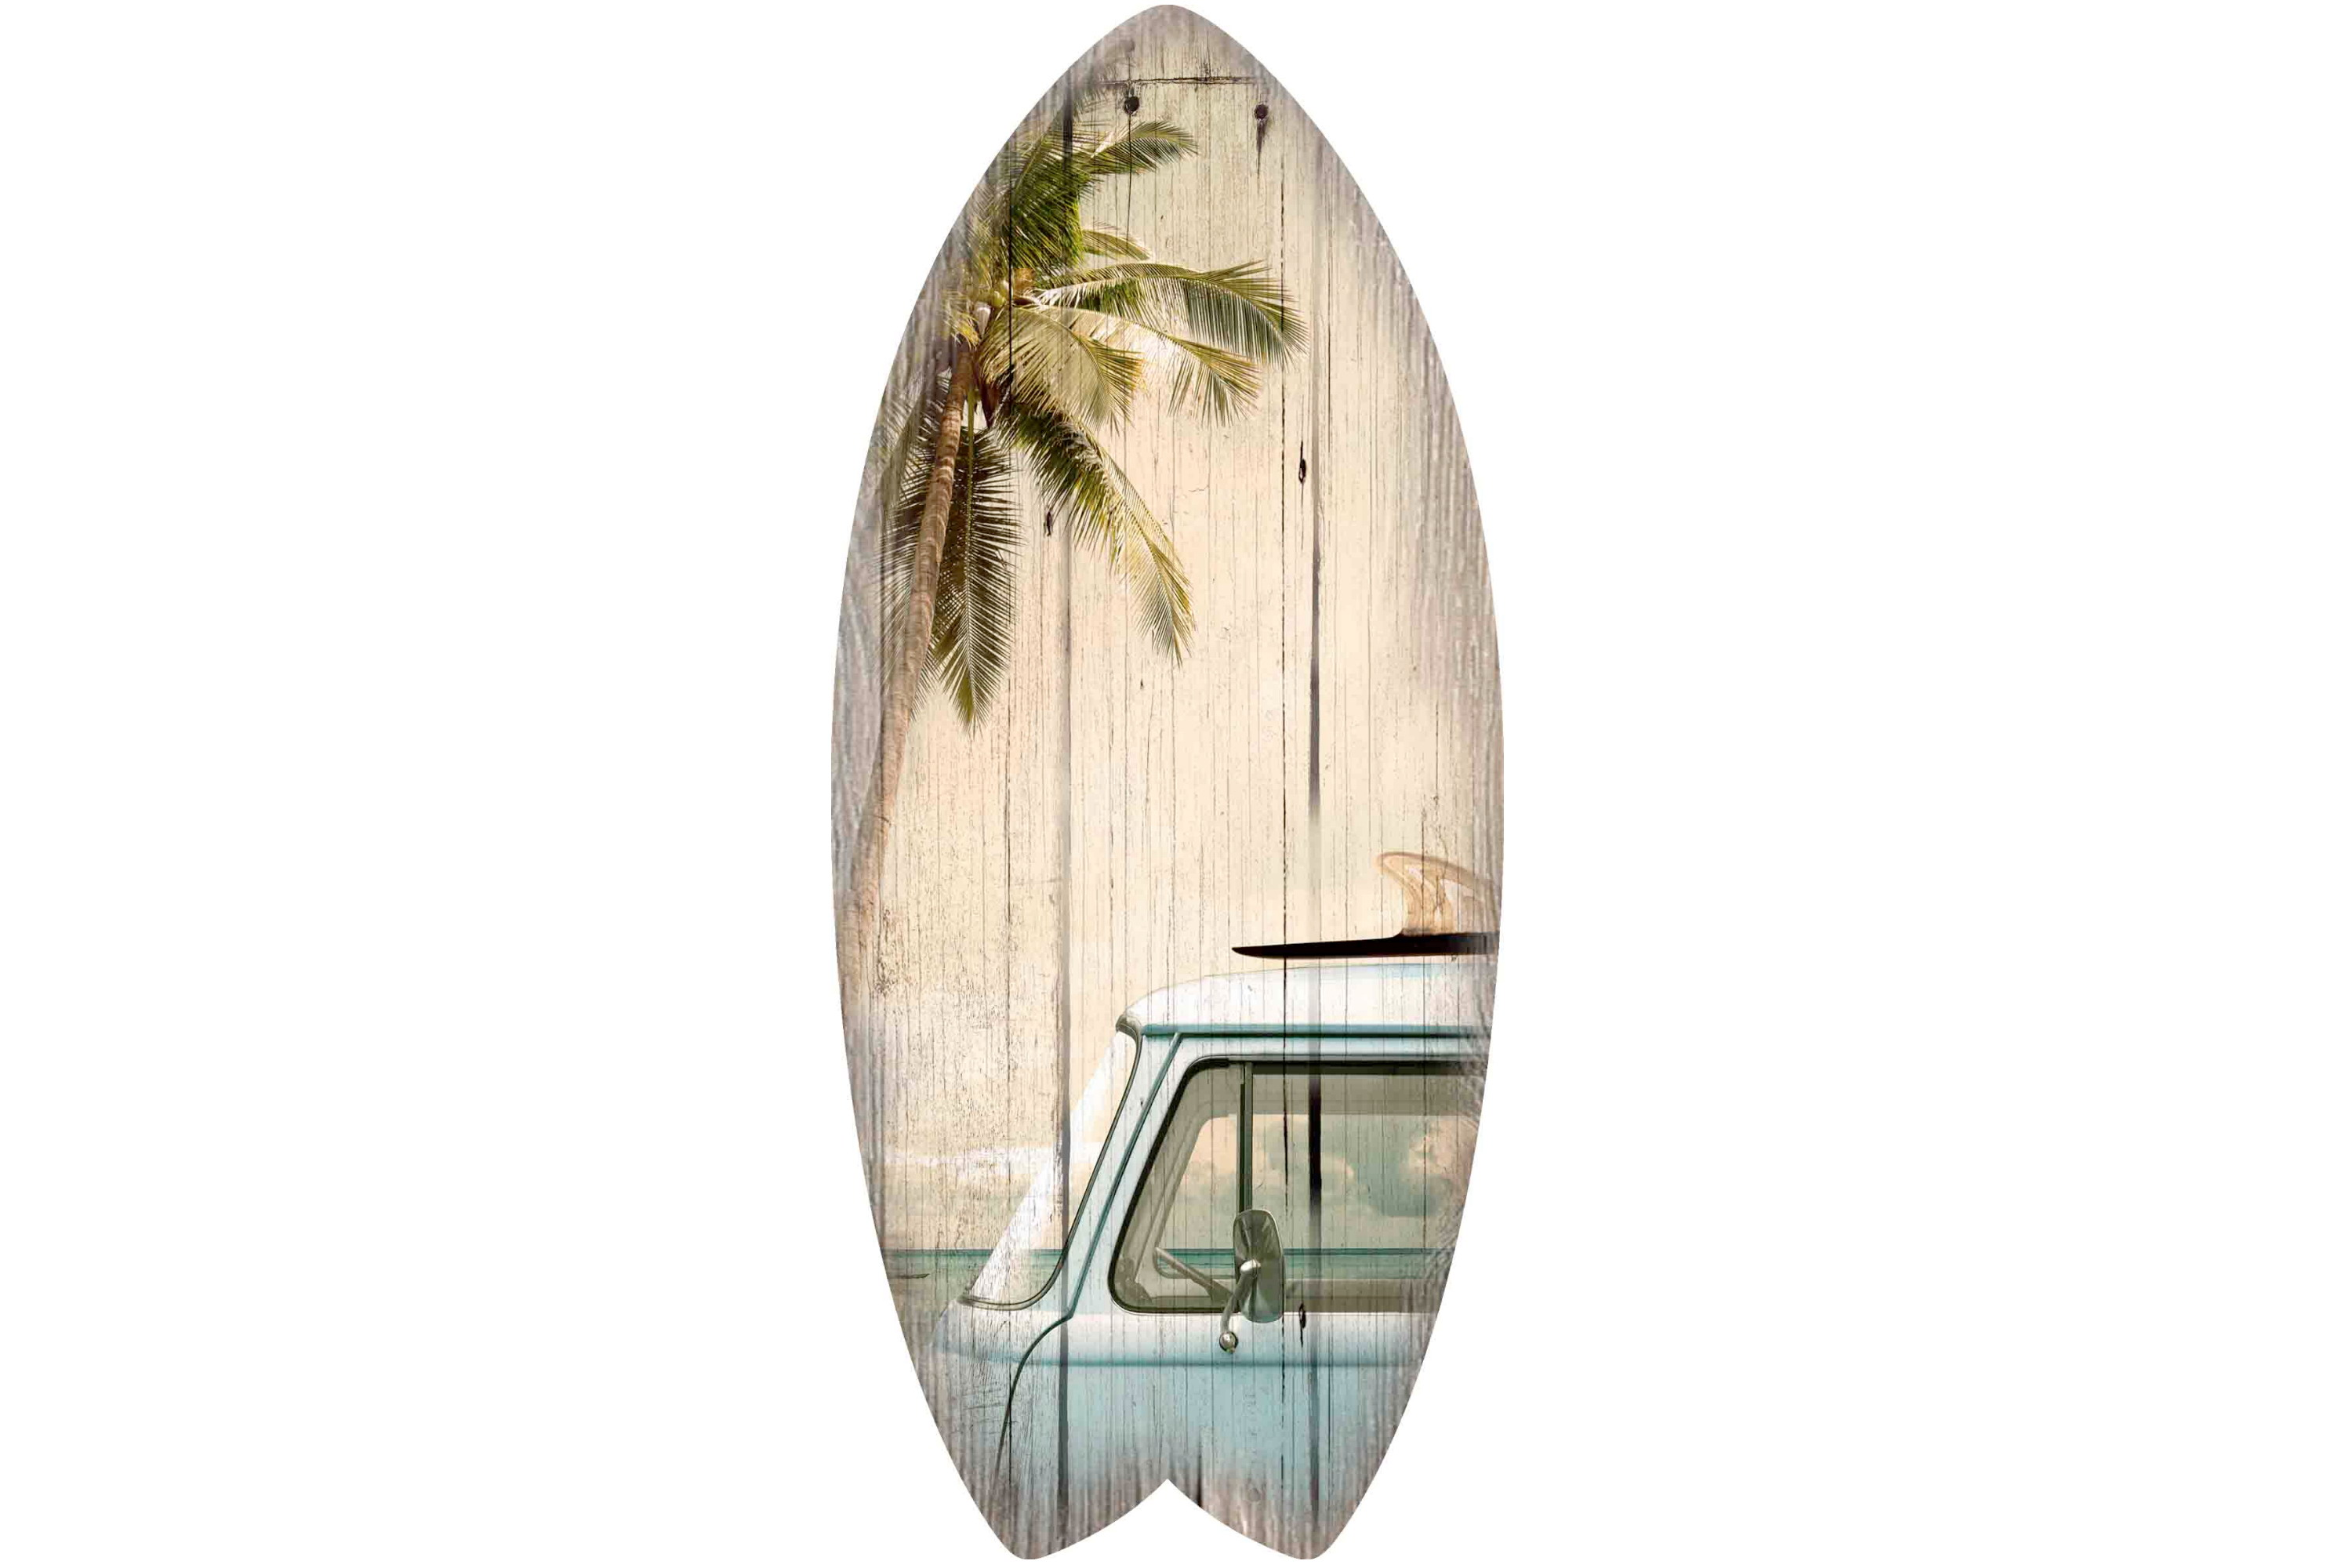 30 x 13cm Wooden Surfboard Surfbus Palm Tree Design